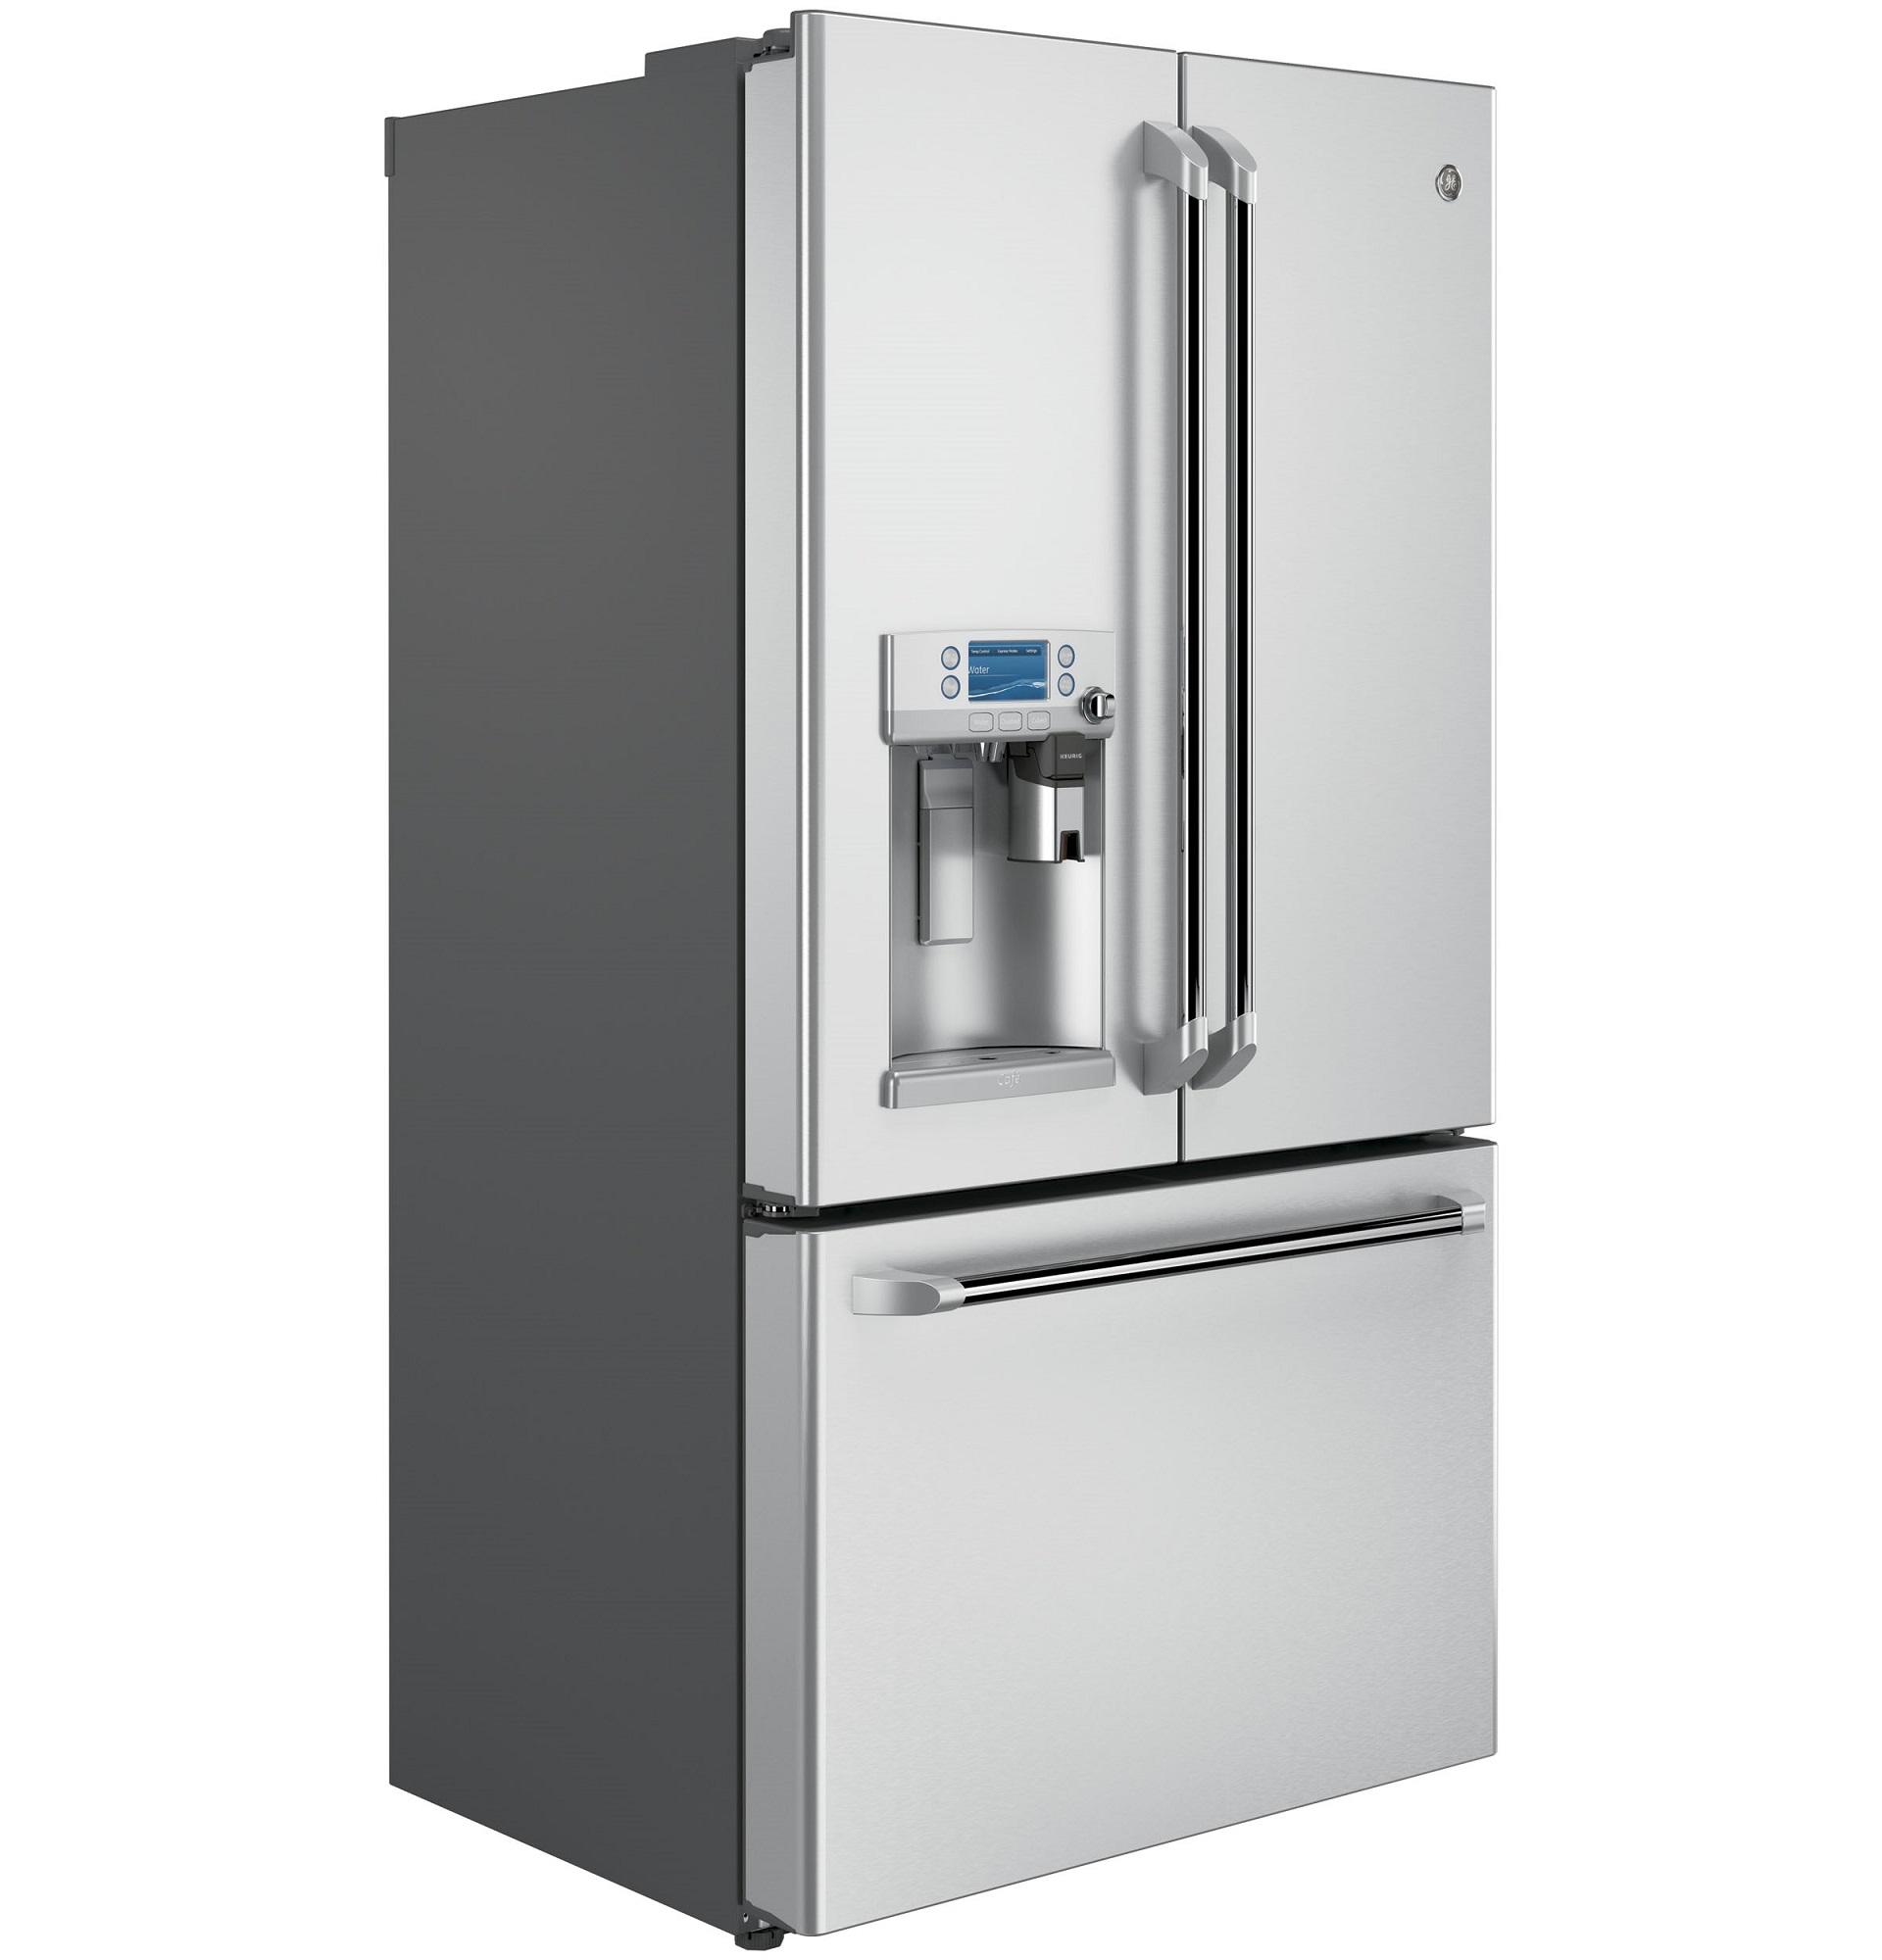 GE Cafe™ Series CYE22USHSS 22.2 cu. ft. Counter-Depth French-Door Refrigerator - Stainless Steel